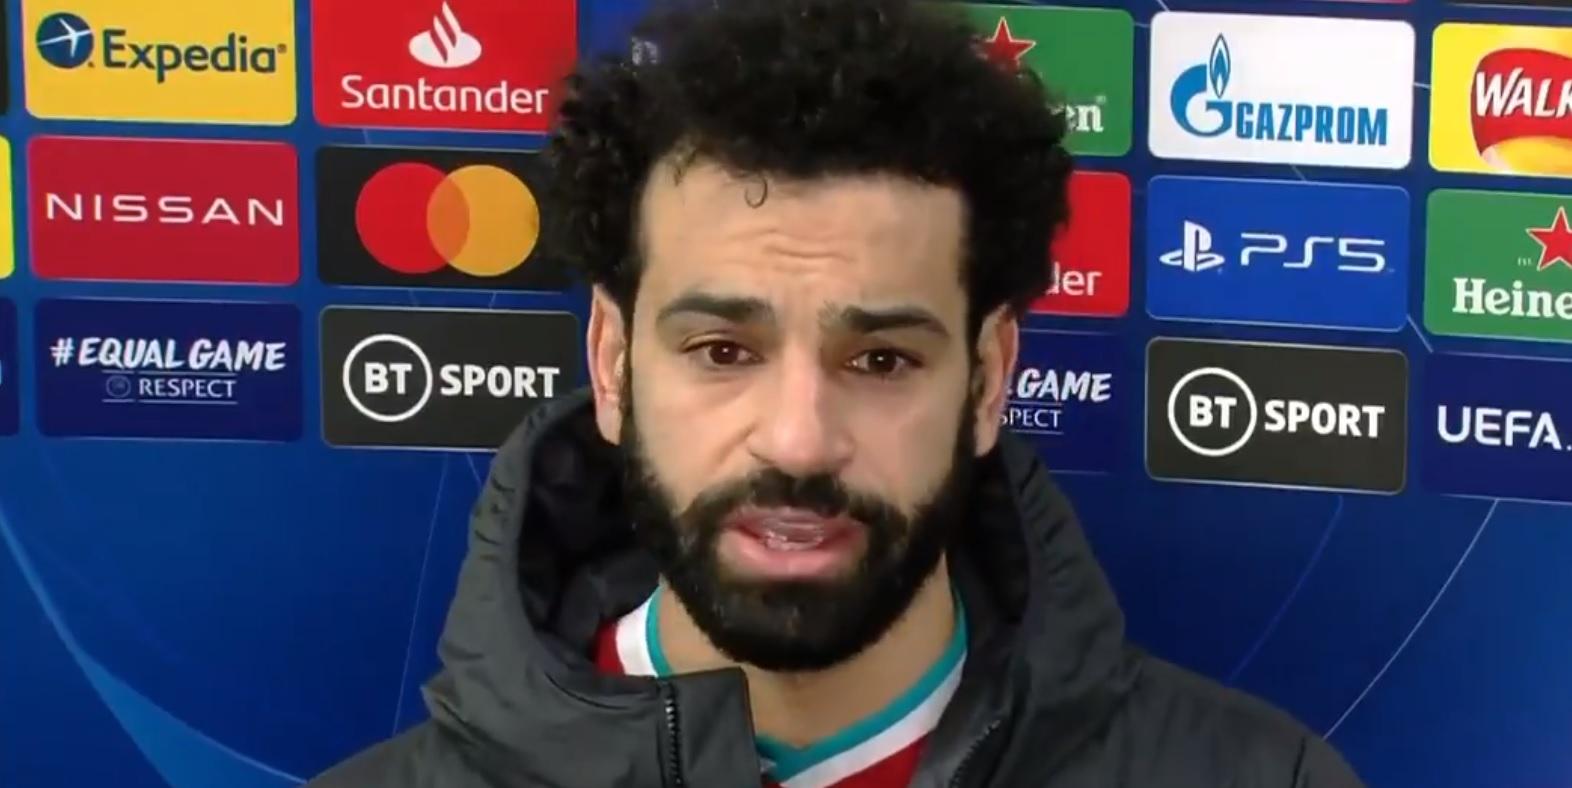 (Video) Salah highlights Fabinho importance, as Brazilian's return heralds improved Liverpool